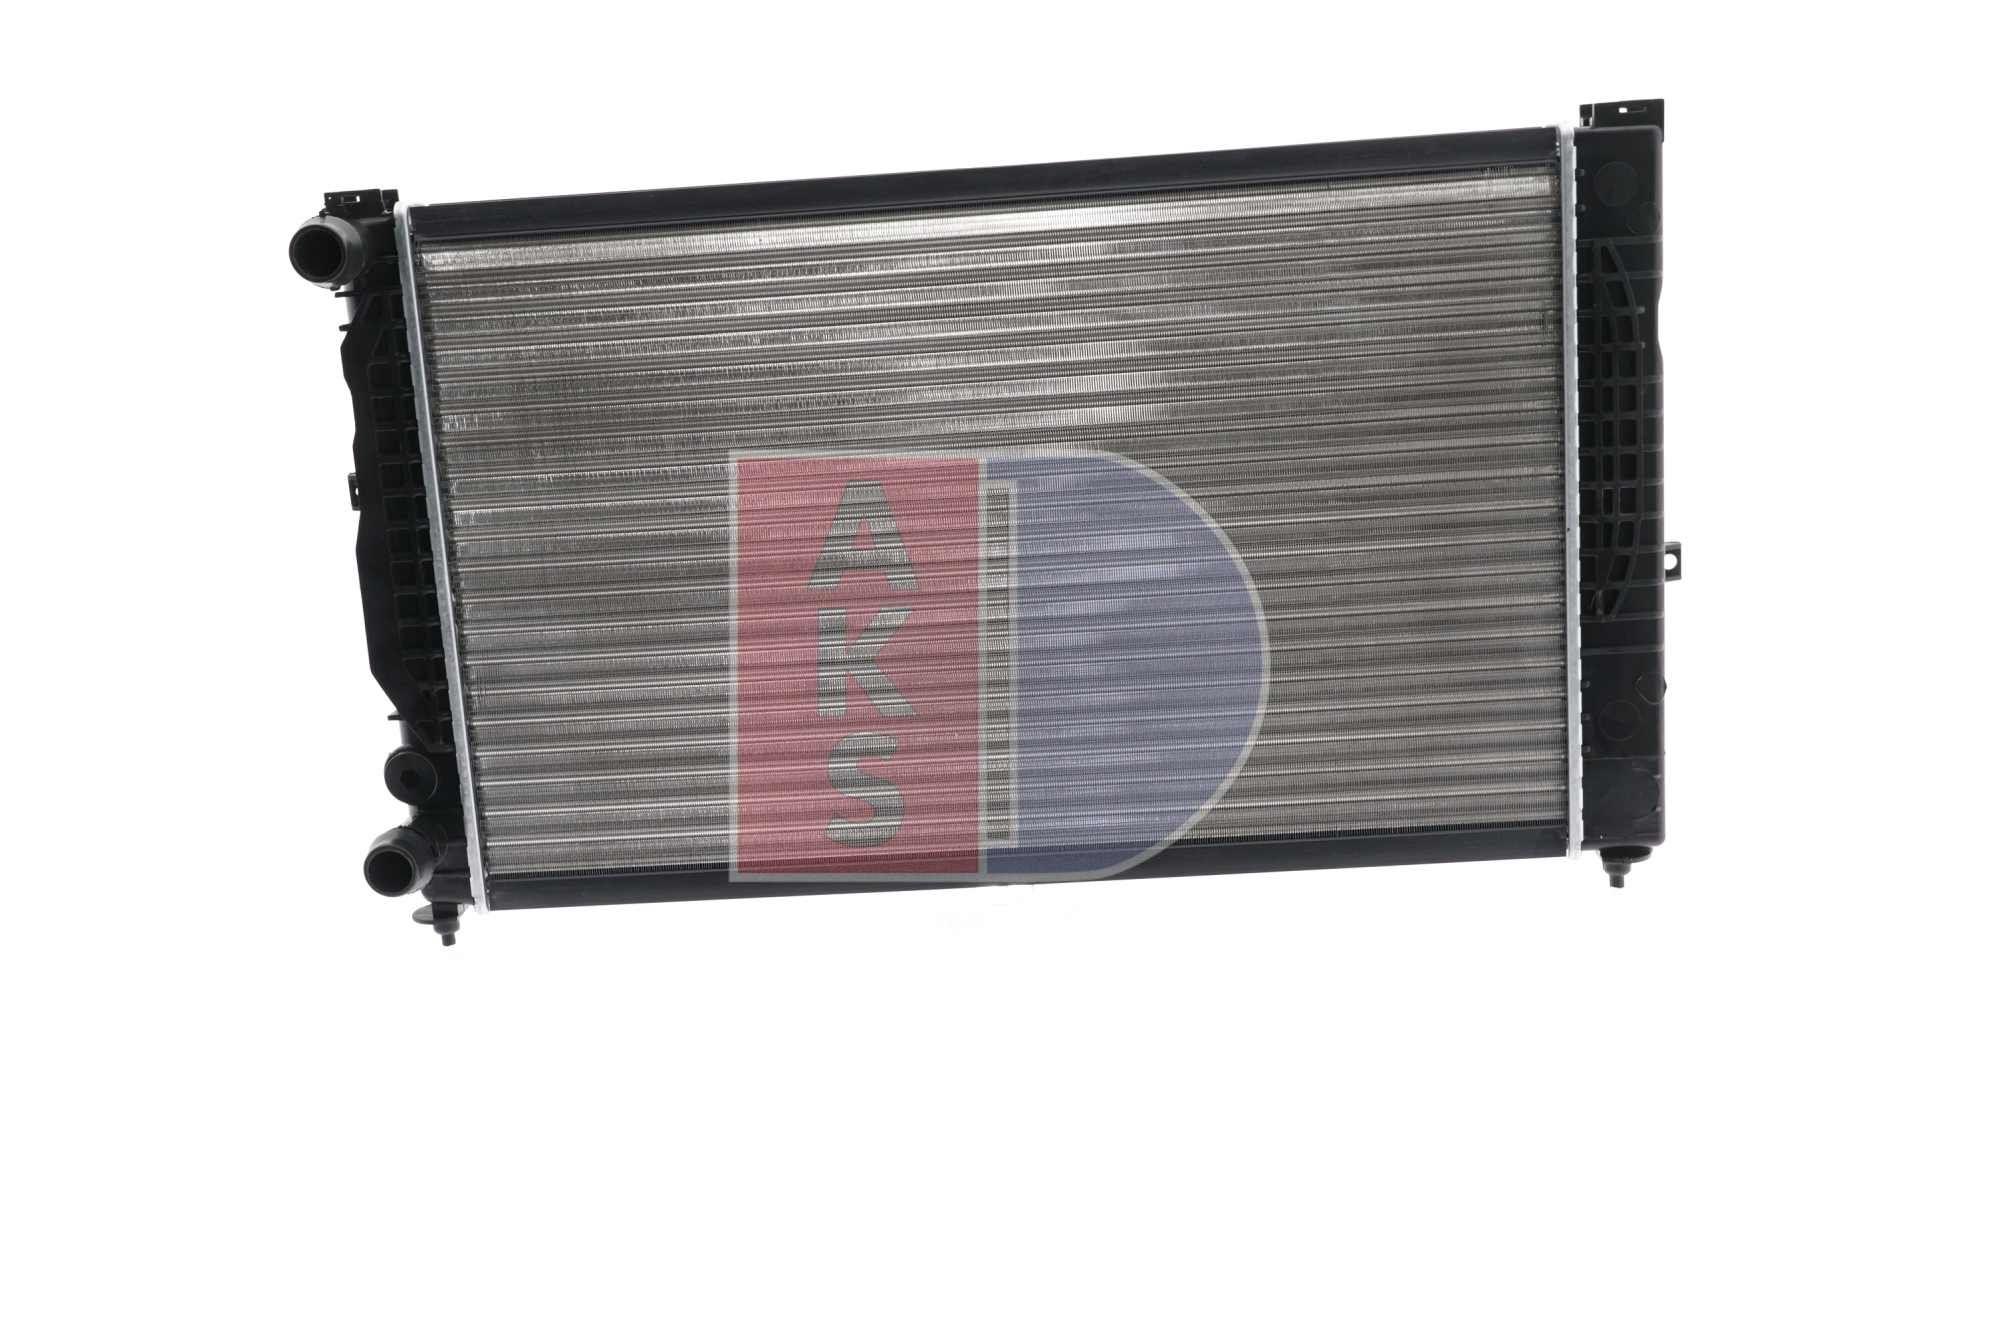 480390N Kühler AKS DASIS - Markenprodukte billig